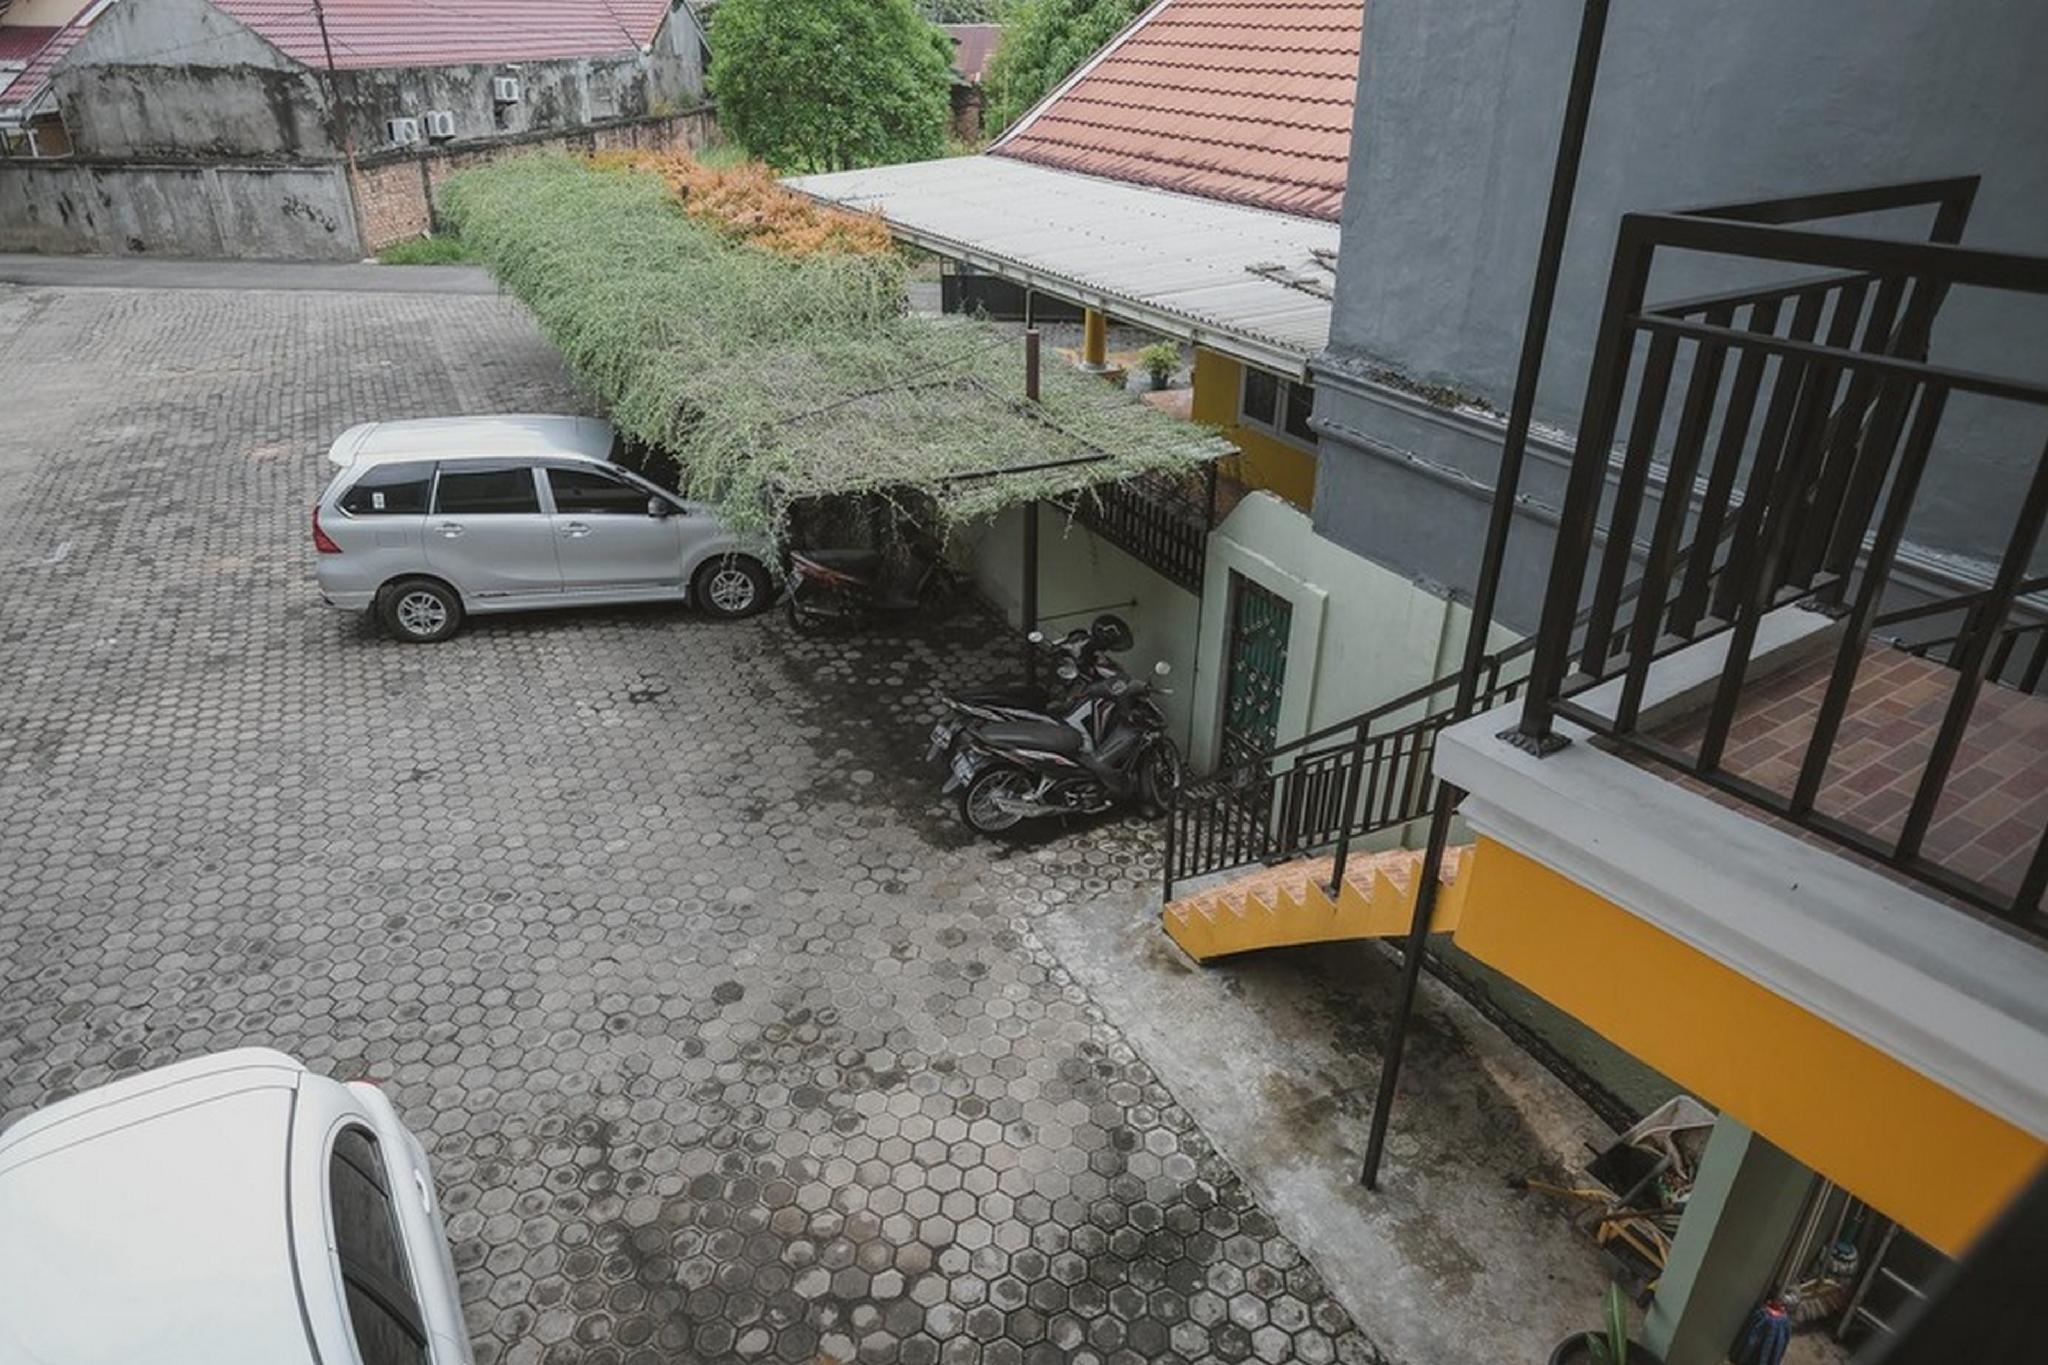 RedDoorz Syariah near Tugu Juang Jambi 2